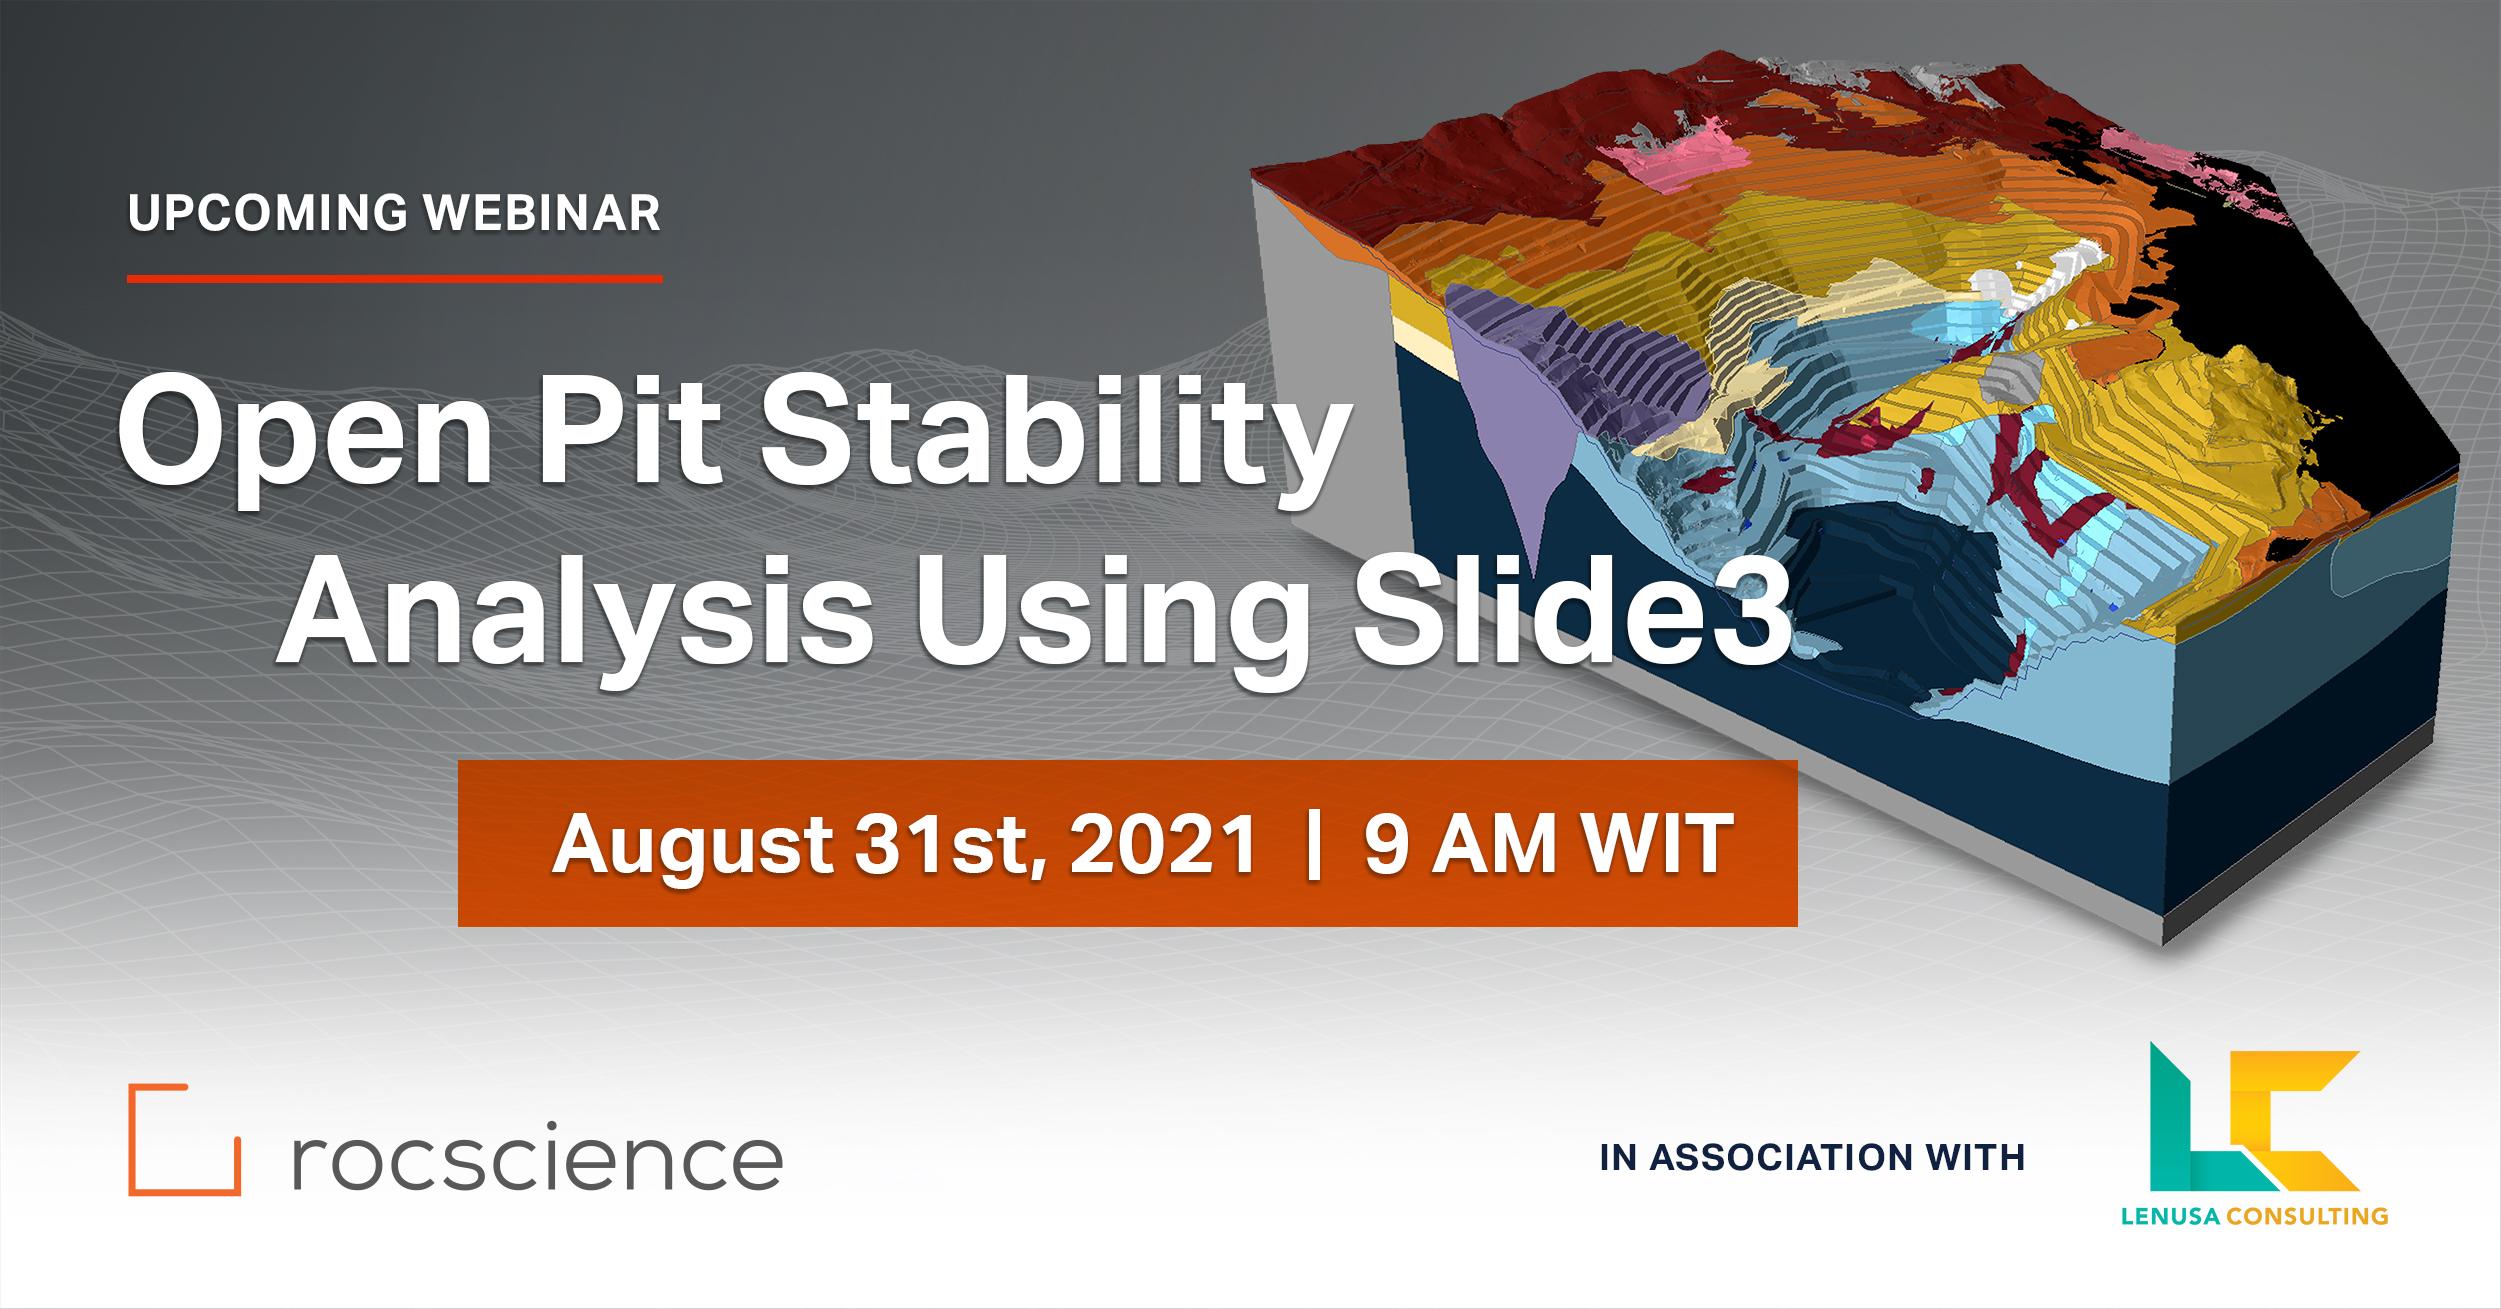 Rocscience Webinar: Open Pit Stability Analysis Using Slide3